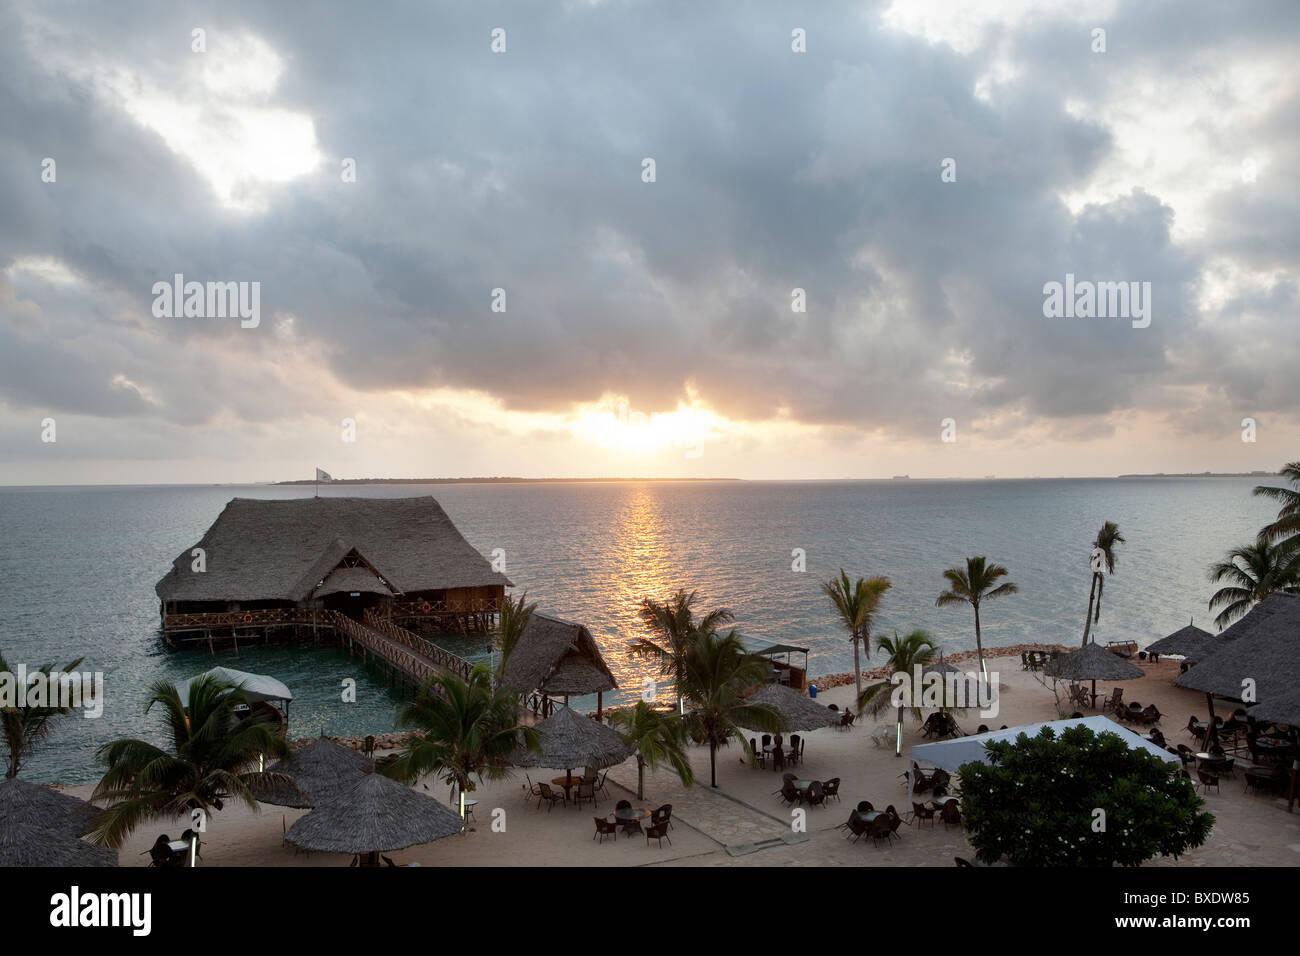 Sunrise over the Indian Ocean in Dar es Salaam, Tanzania, East Africa. - Stock Image